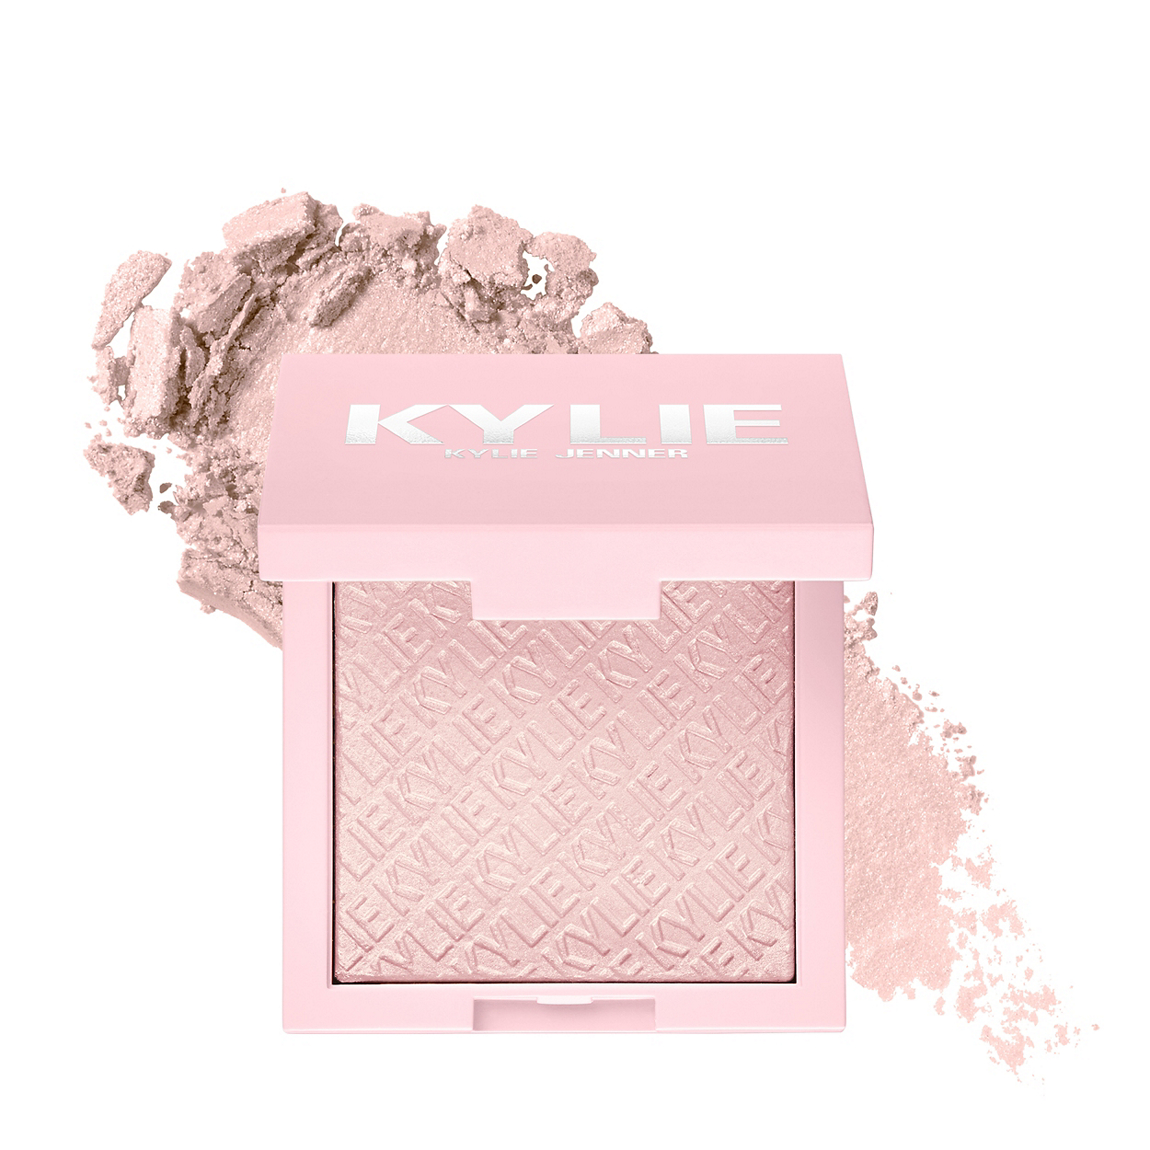 Princess Please Kylighter Illuminating Powder